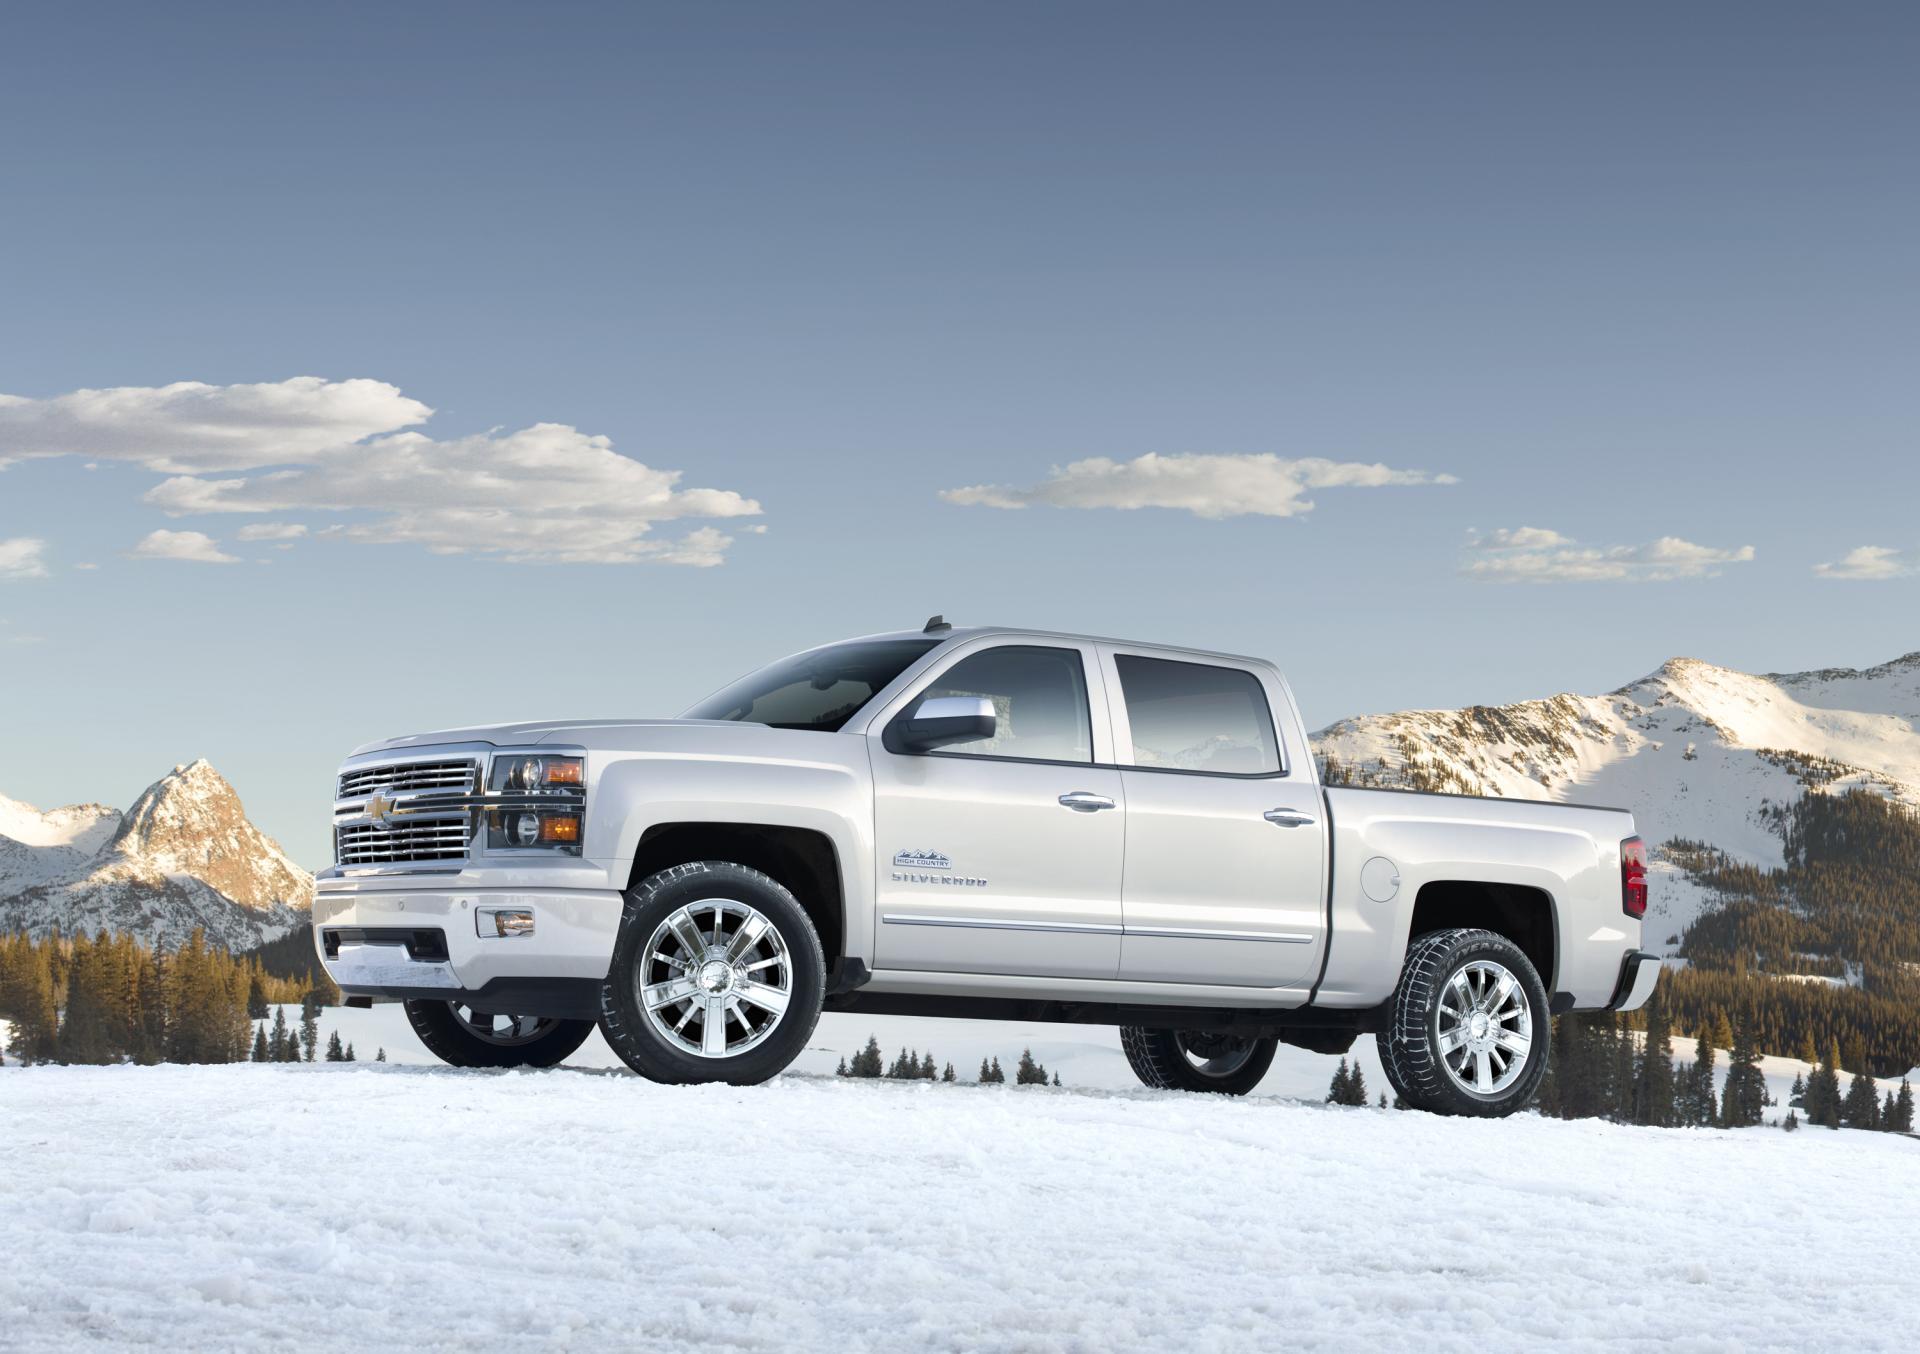 2013 Chevrolet Silverado High Country News and Information